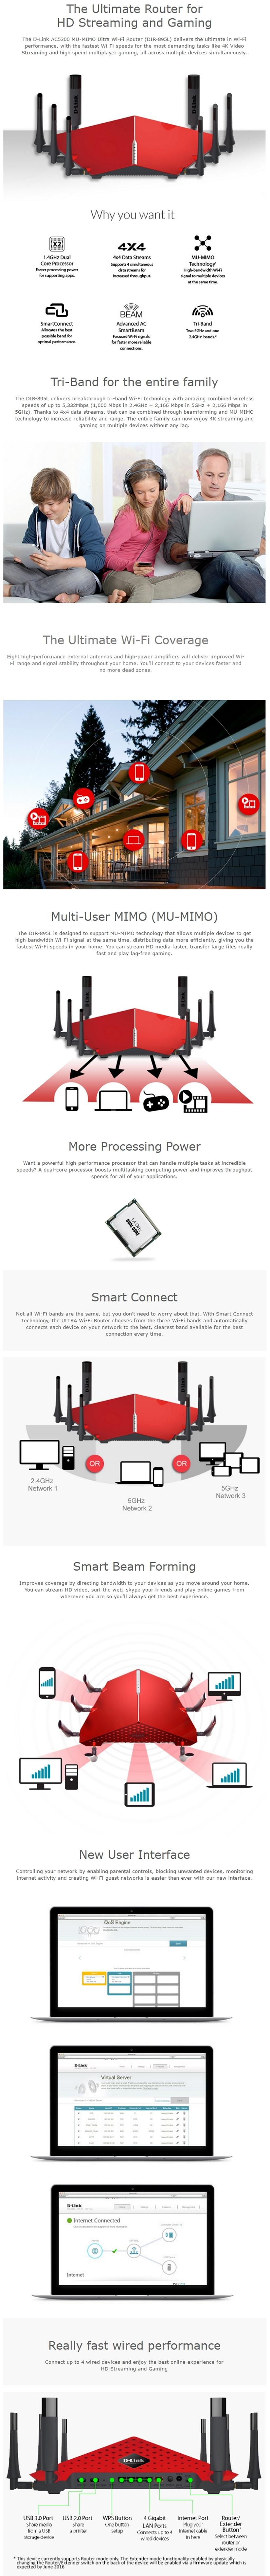 D-Link DIR-895L AC5300 MU-MIMO Ultra Wi-Fi Router